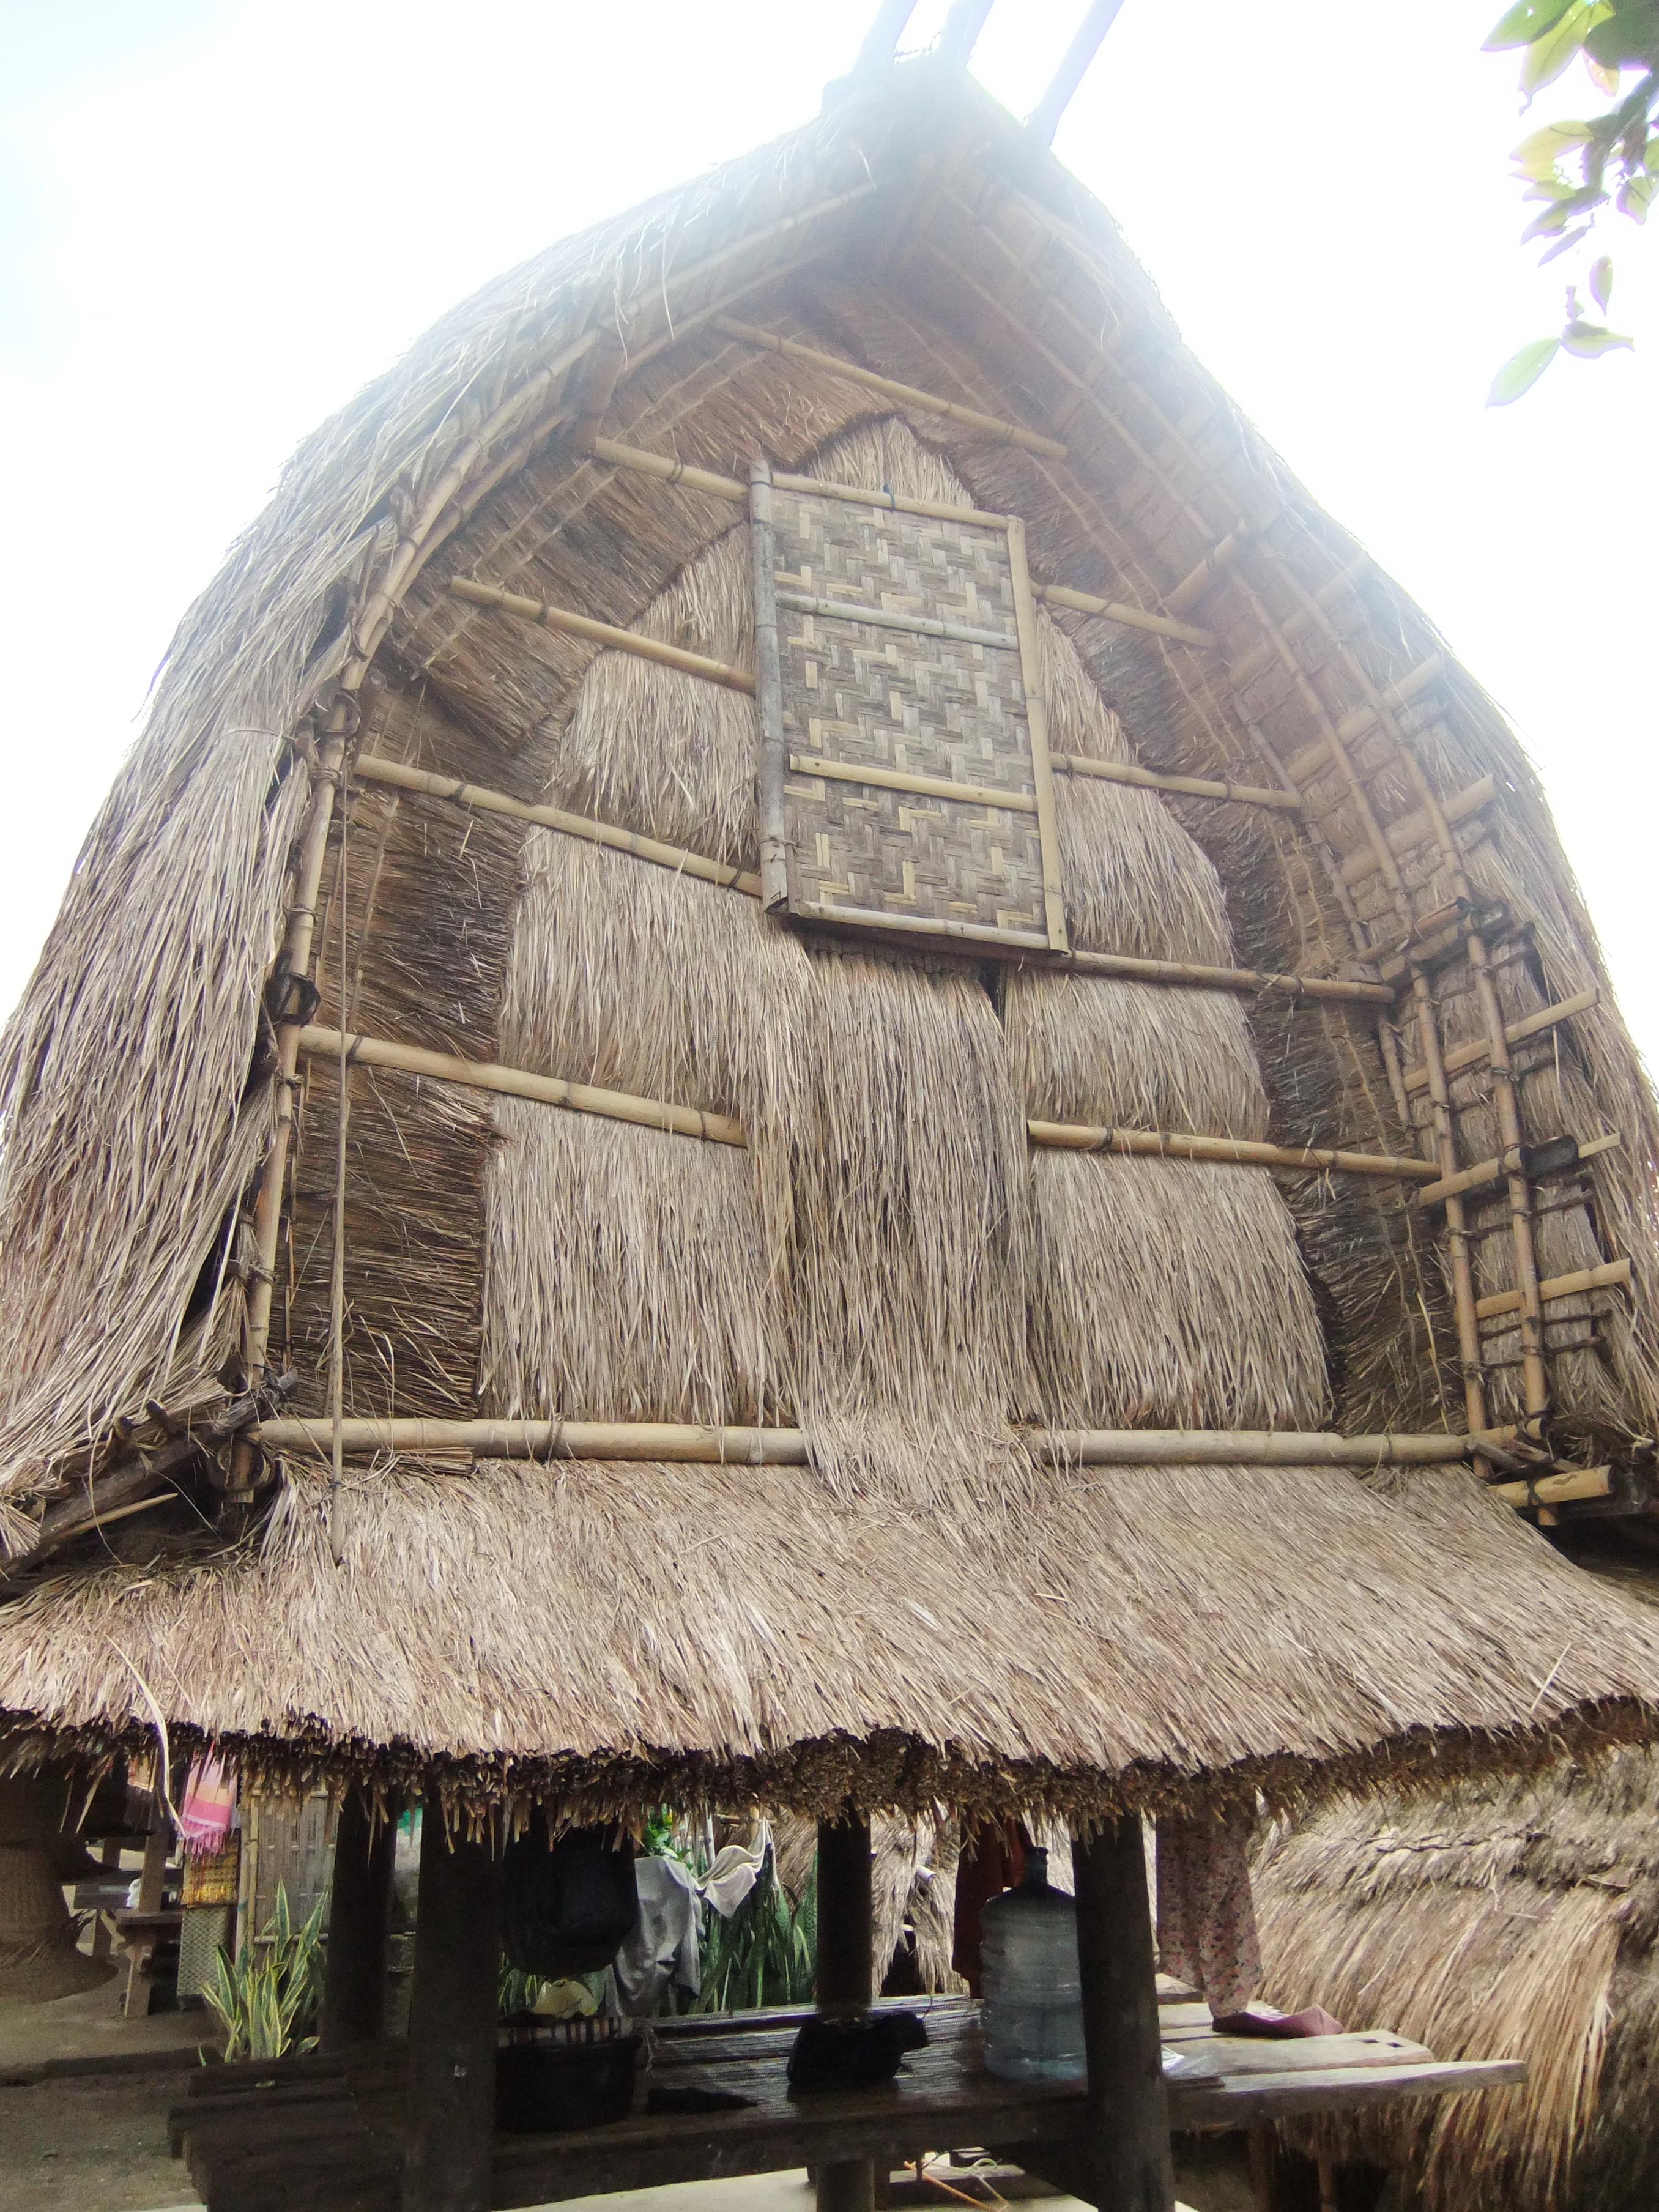 Negara Lumbung Padi Asia Tenggara : negara, lumbung, tenggara, Lumbung, Wikipedia, Bahasa, Indonesia,, Ensiklopedia, Bebas